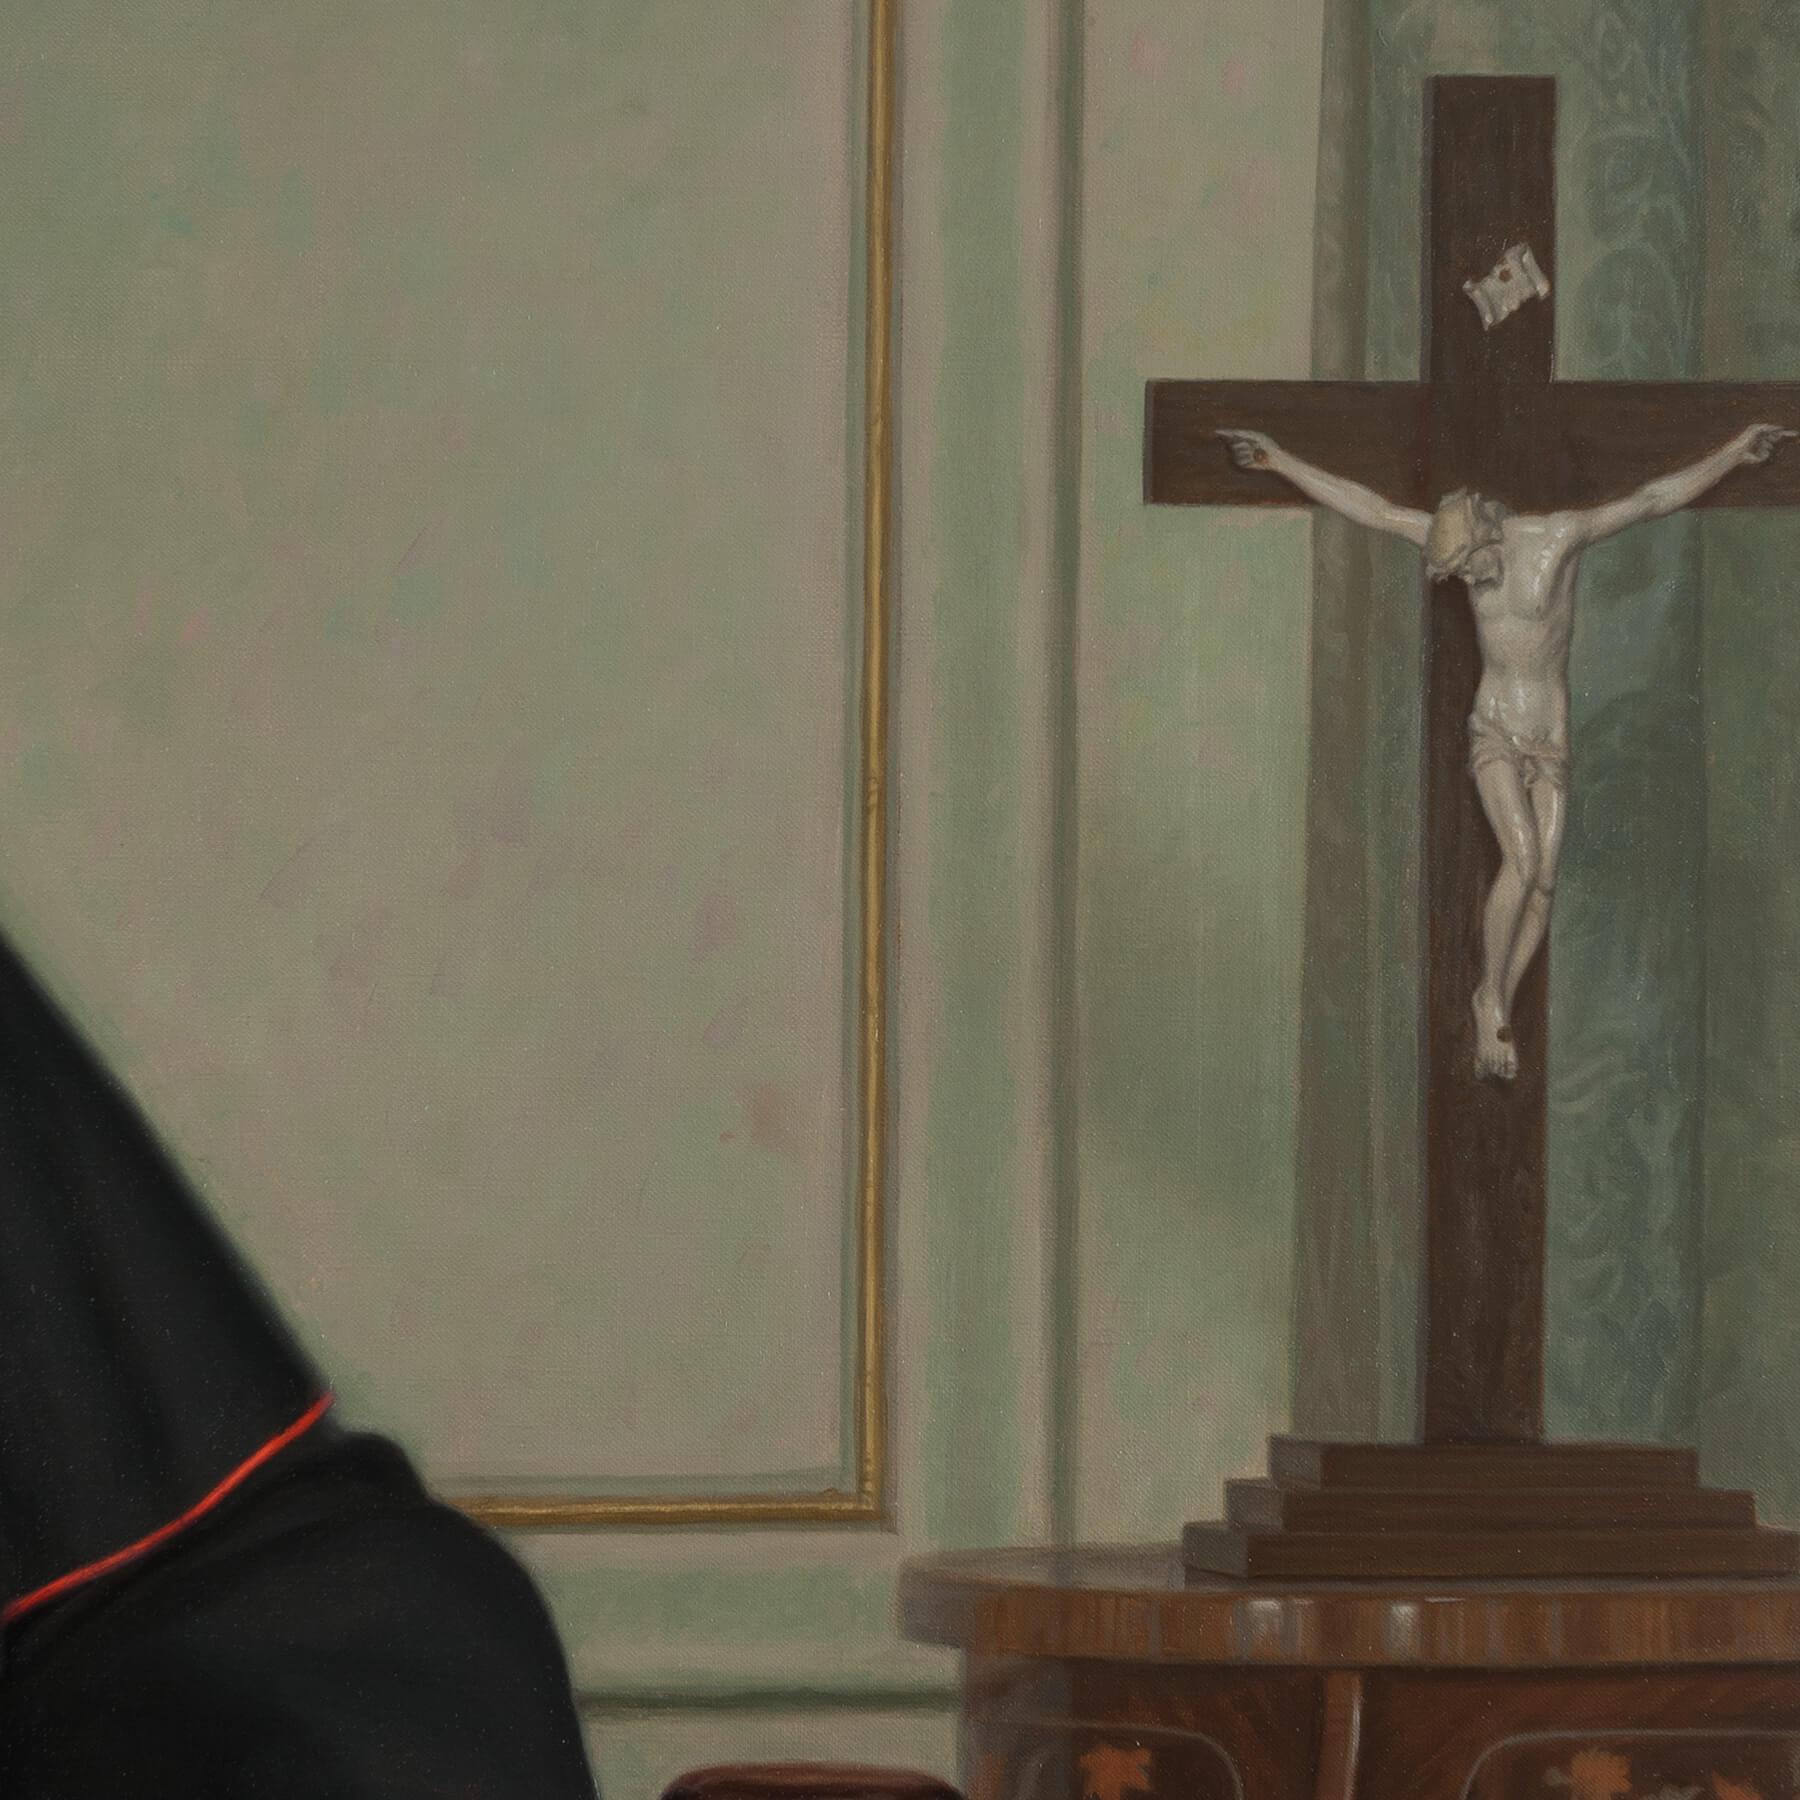 Crucifix statuepainting for Commissioned Portrait Art